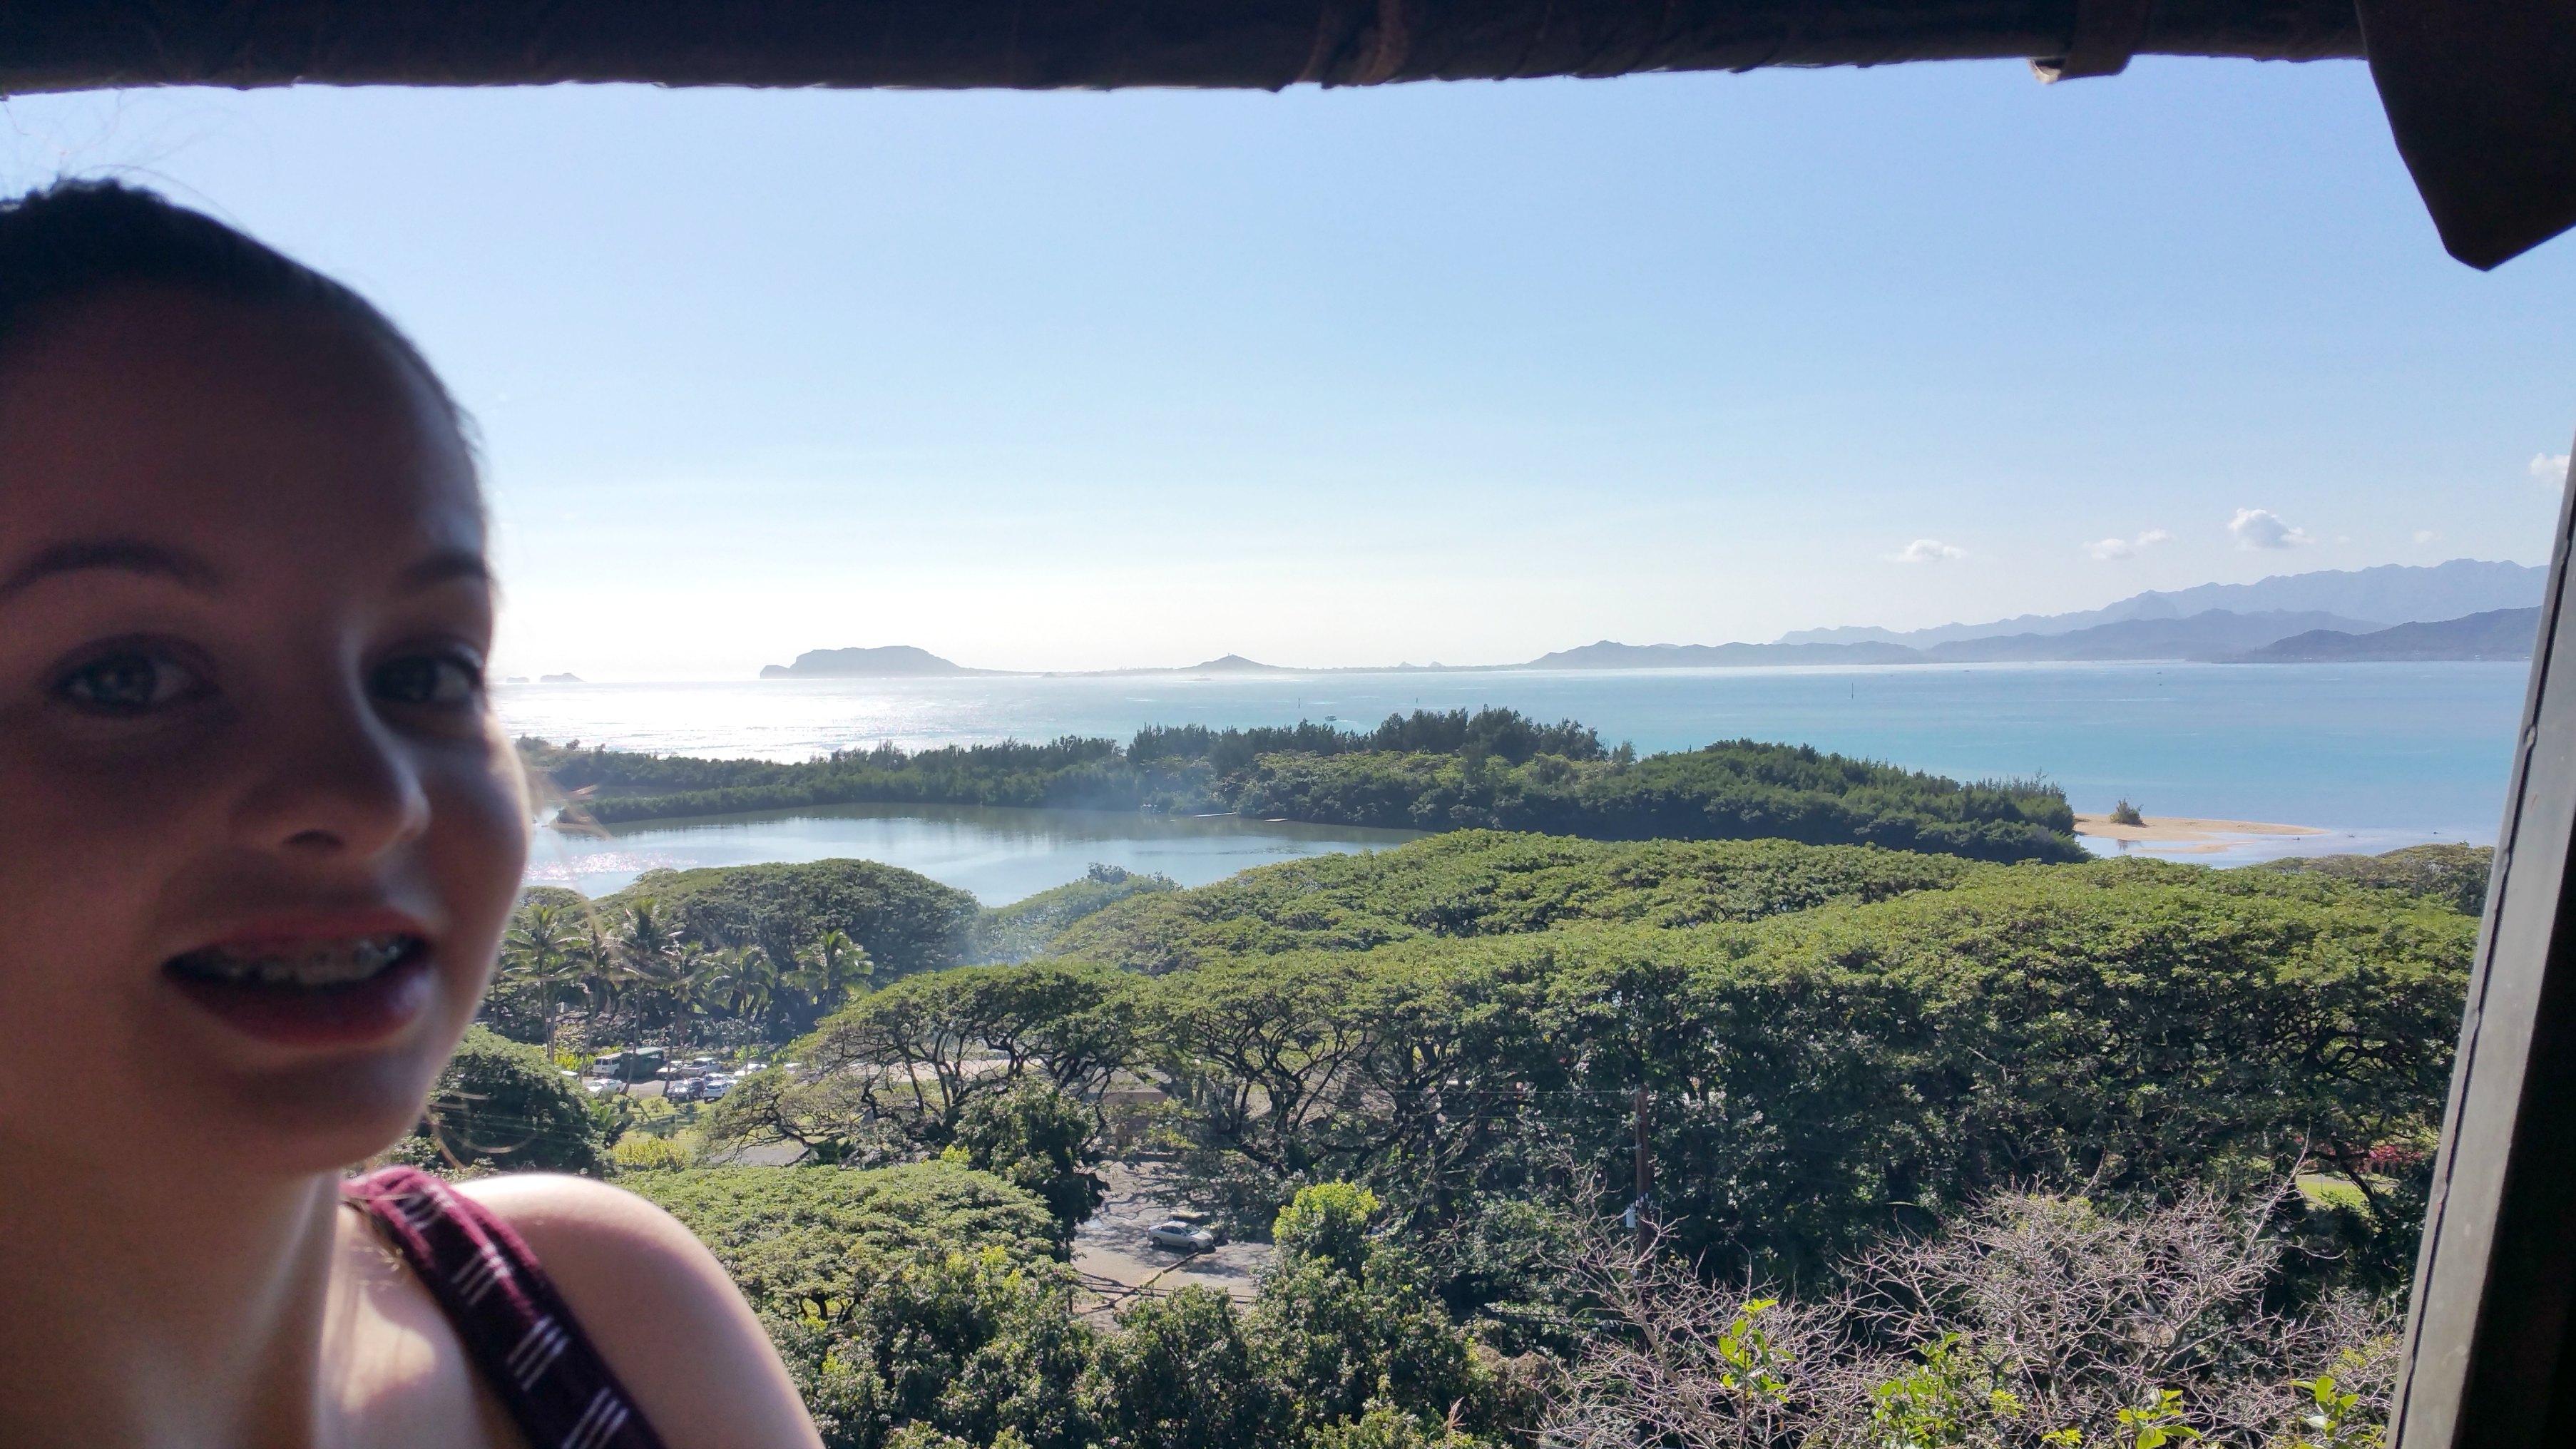 jungle adventure in hawaii